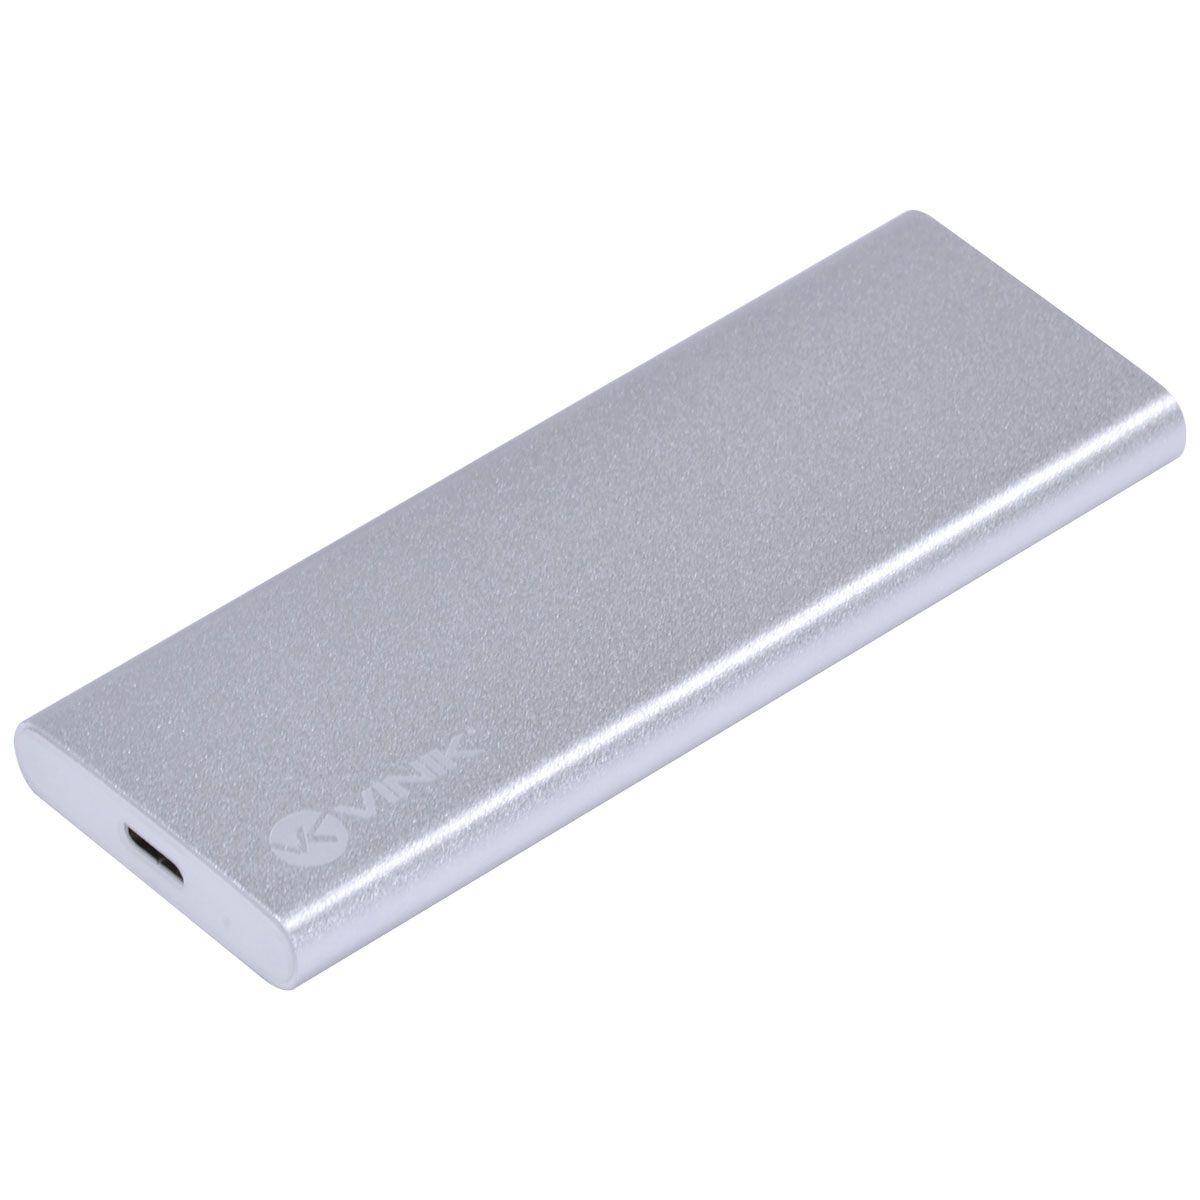 Case Externo para SSD M.2 USB Tipo C para USB 3.0 CS25-C30 29864 - Vinik